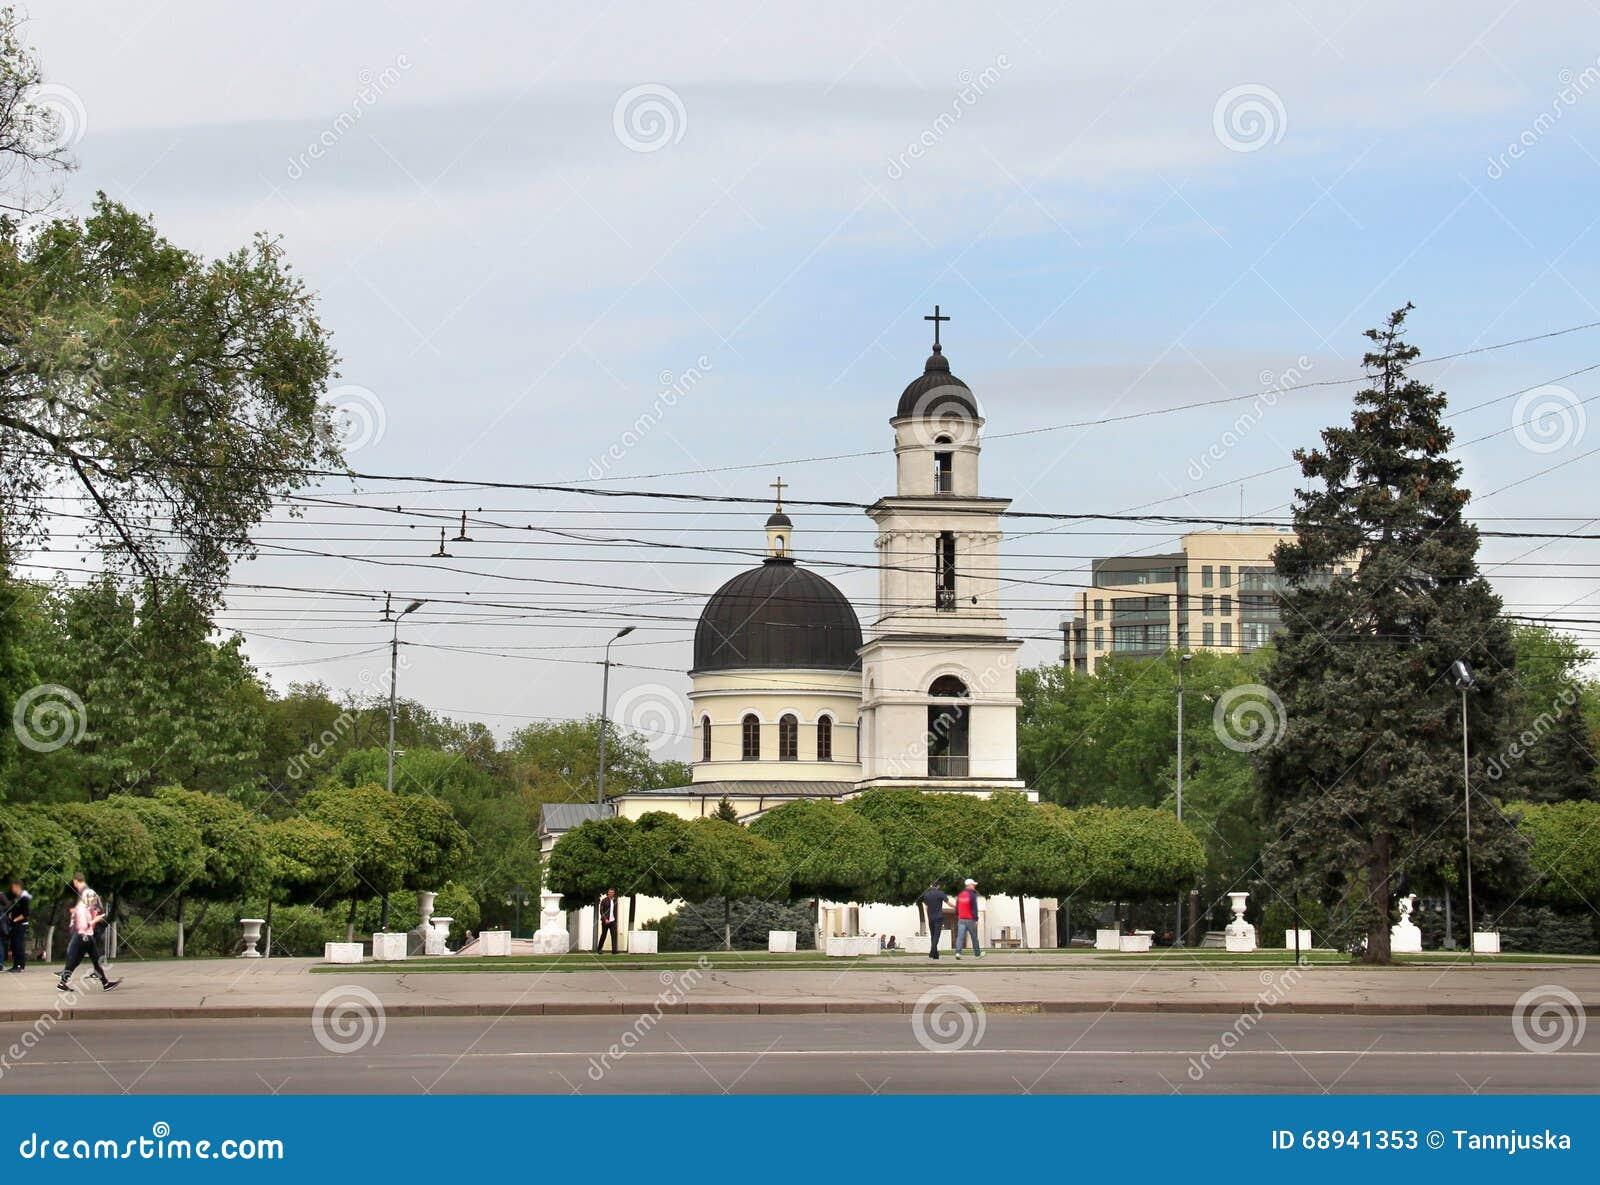 chisinau the capital of moldova essay Define moldovia moldovia synonyms,  capital of moldova, chisinau, kishinev - the capital of moldova  review essay: timur kuran's the.